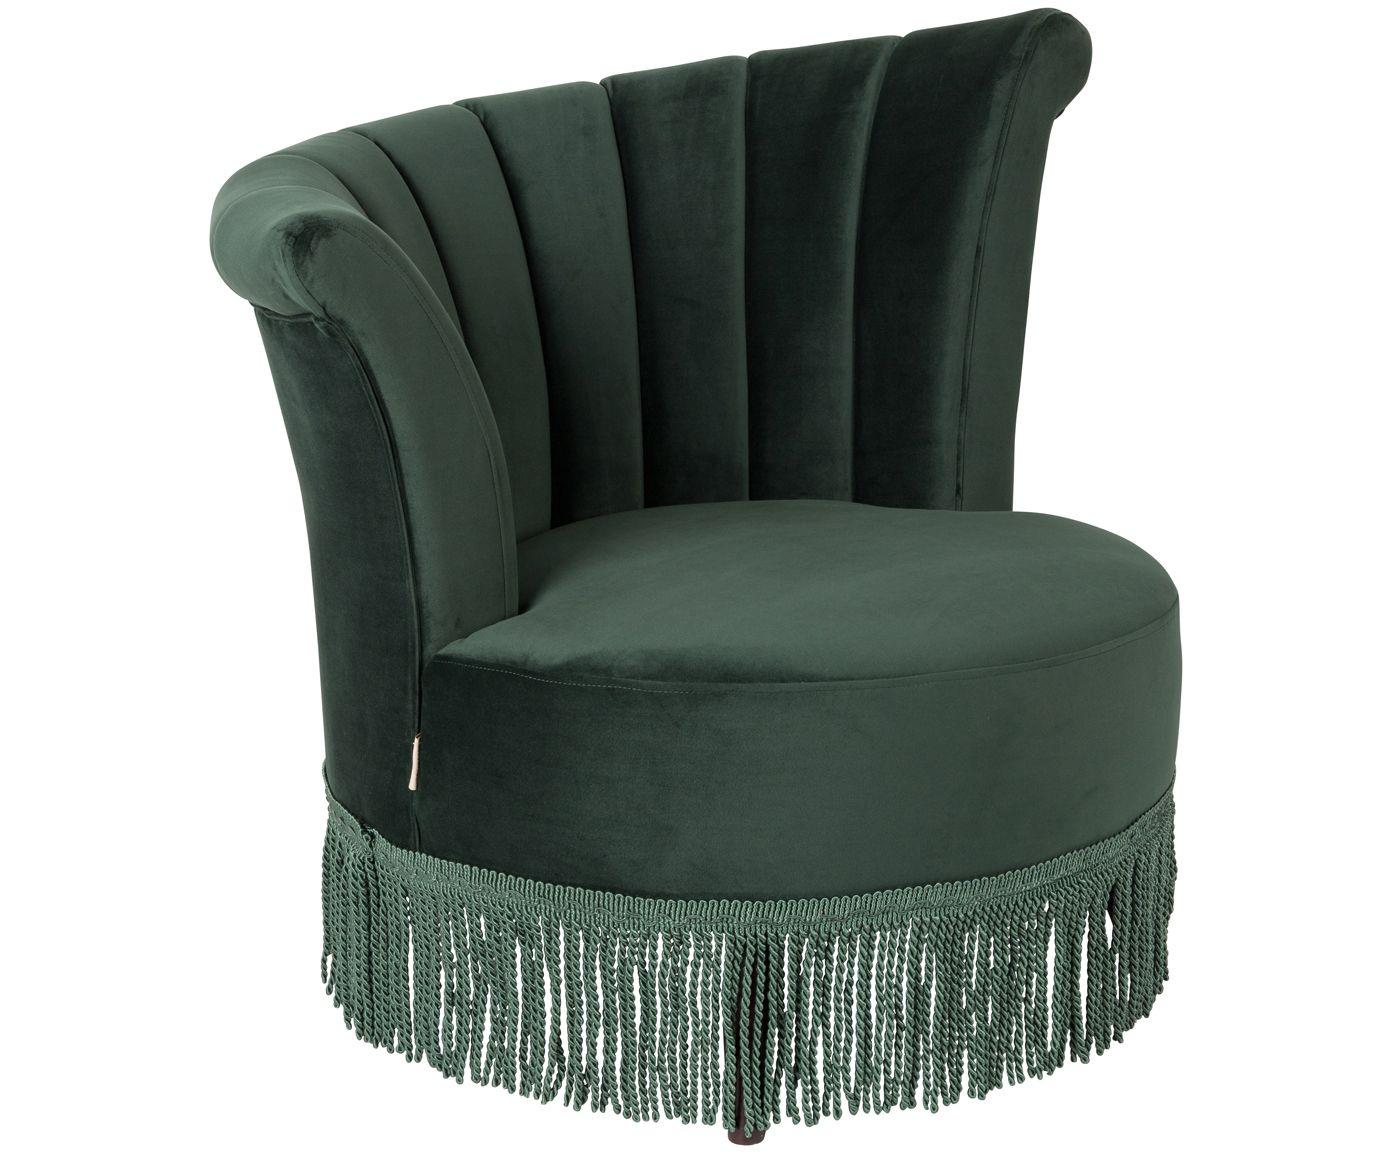 Sitzhocker Anna Lounge Club Möbel Sessel grün